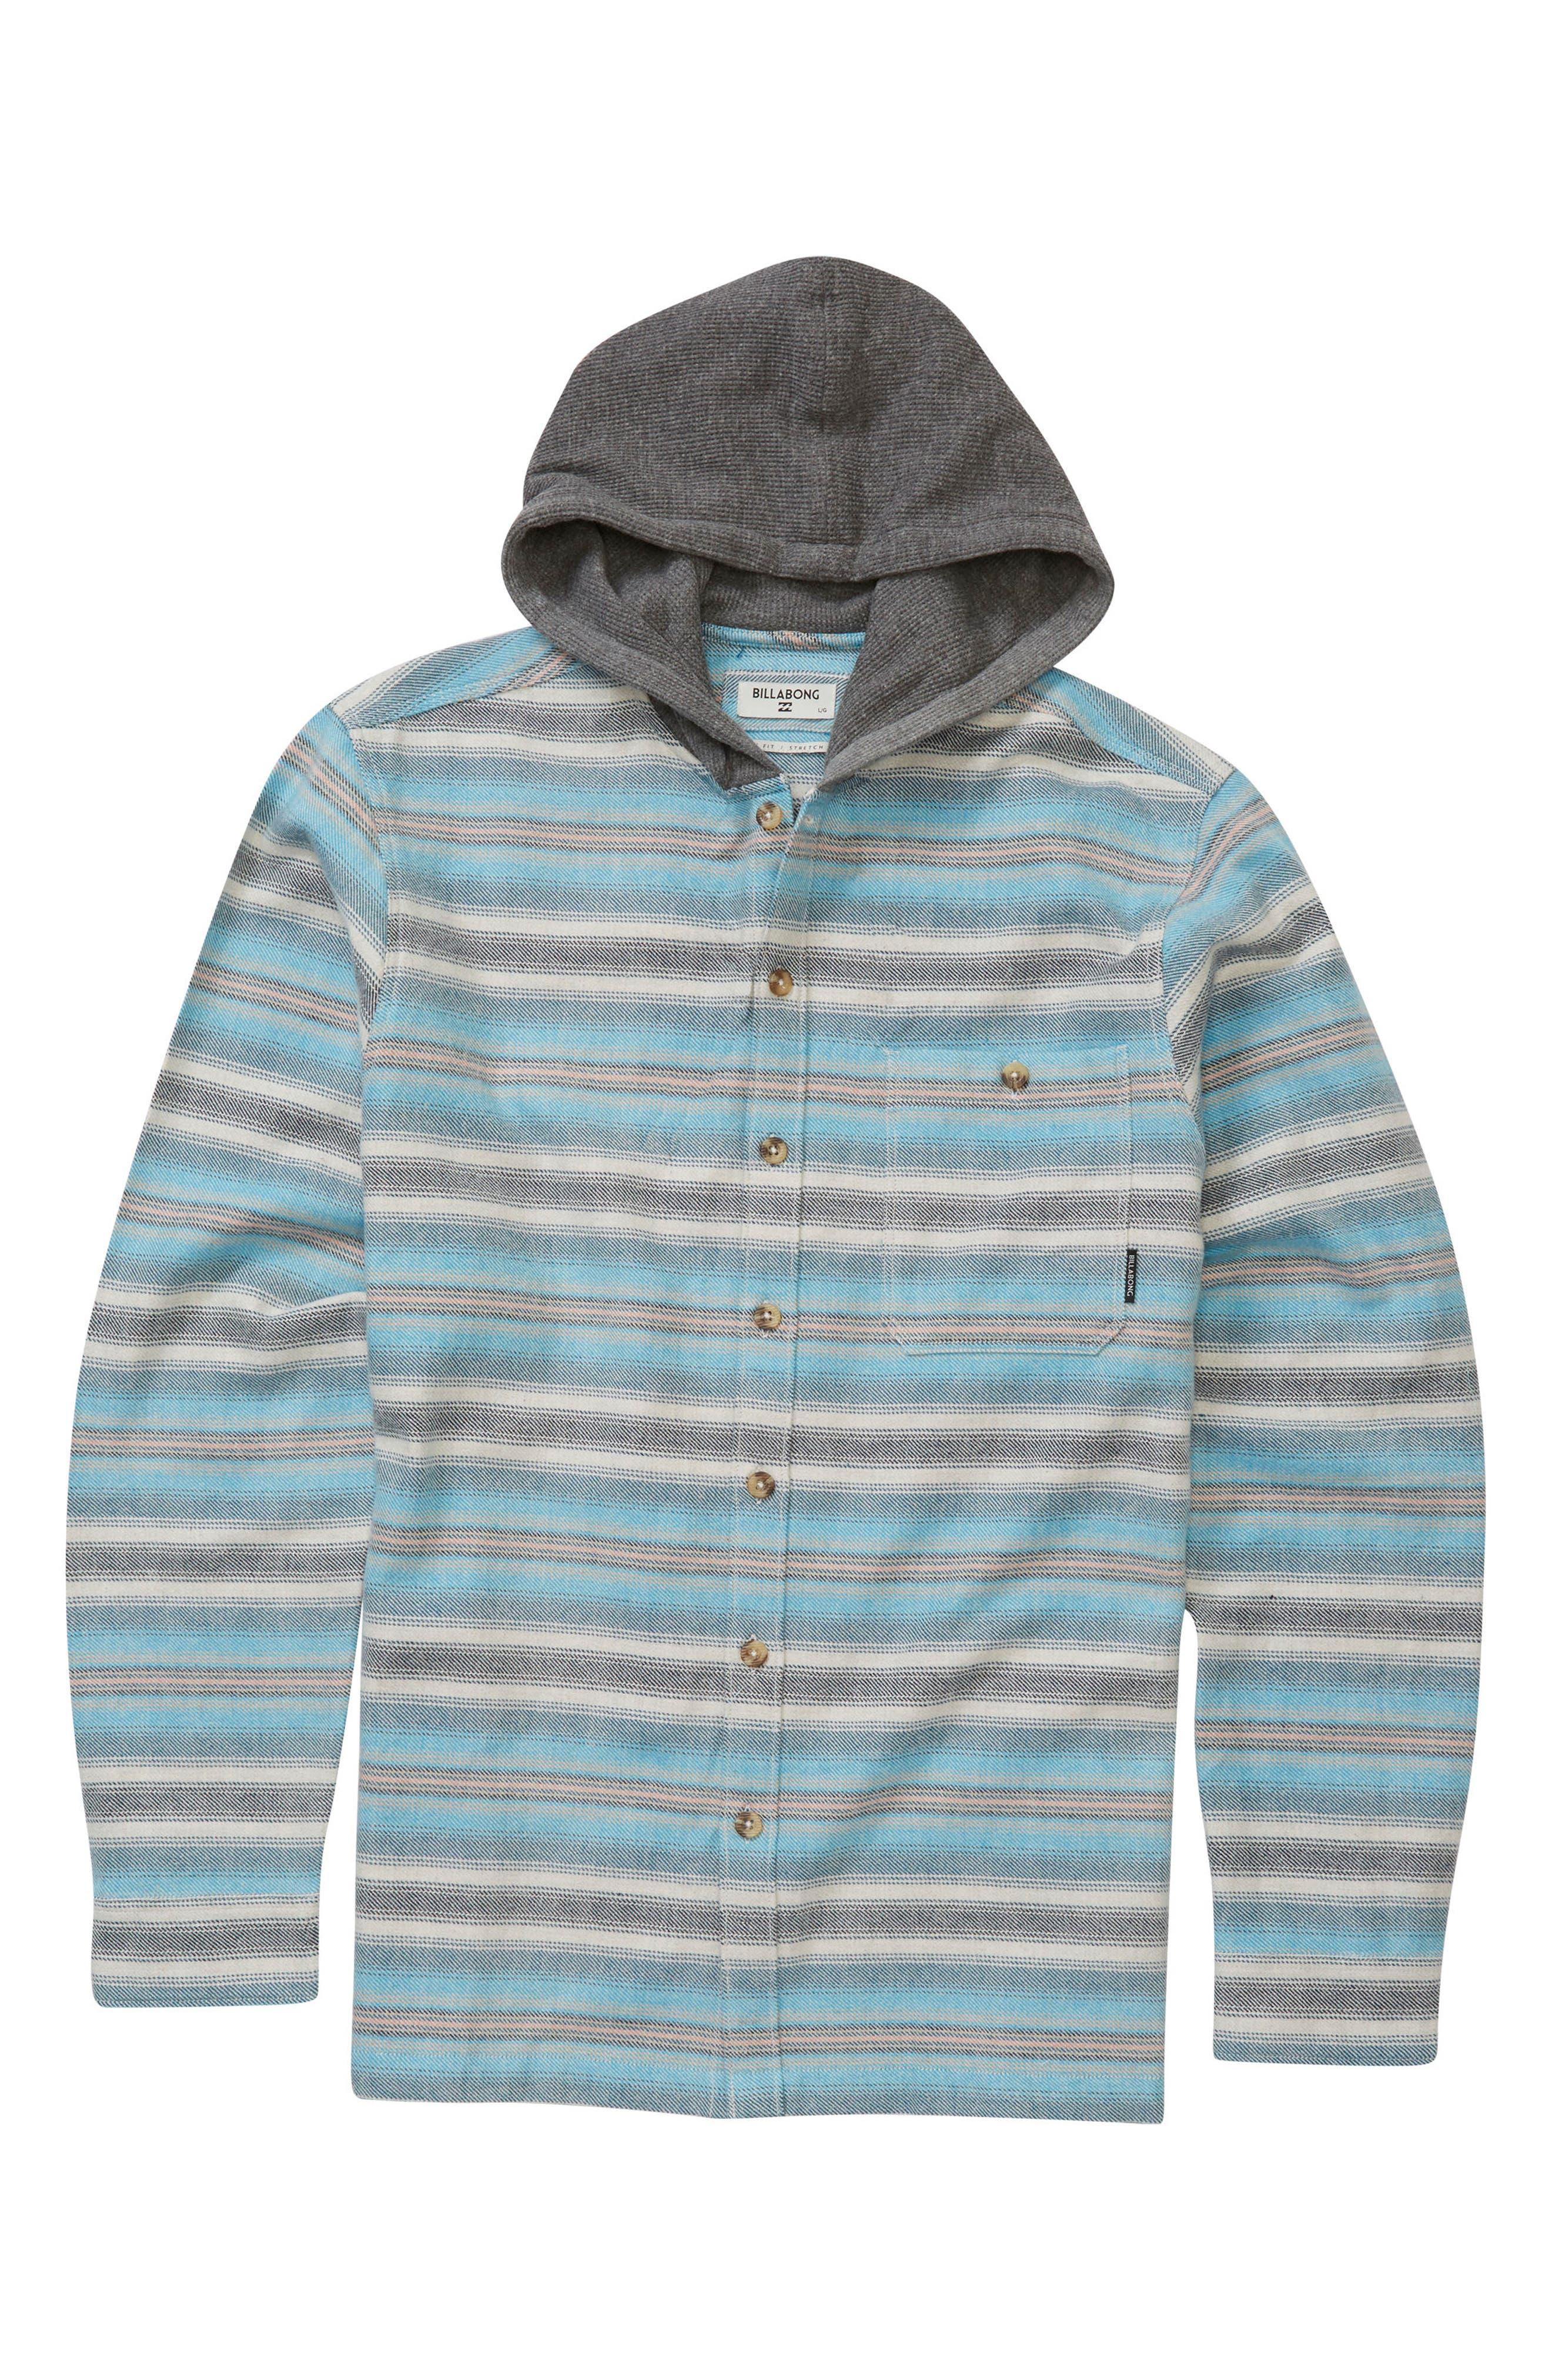 Baja Hooded Shirt,                             Main thumbnail 1, color,                             Stone